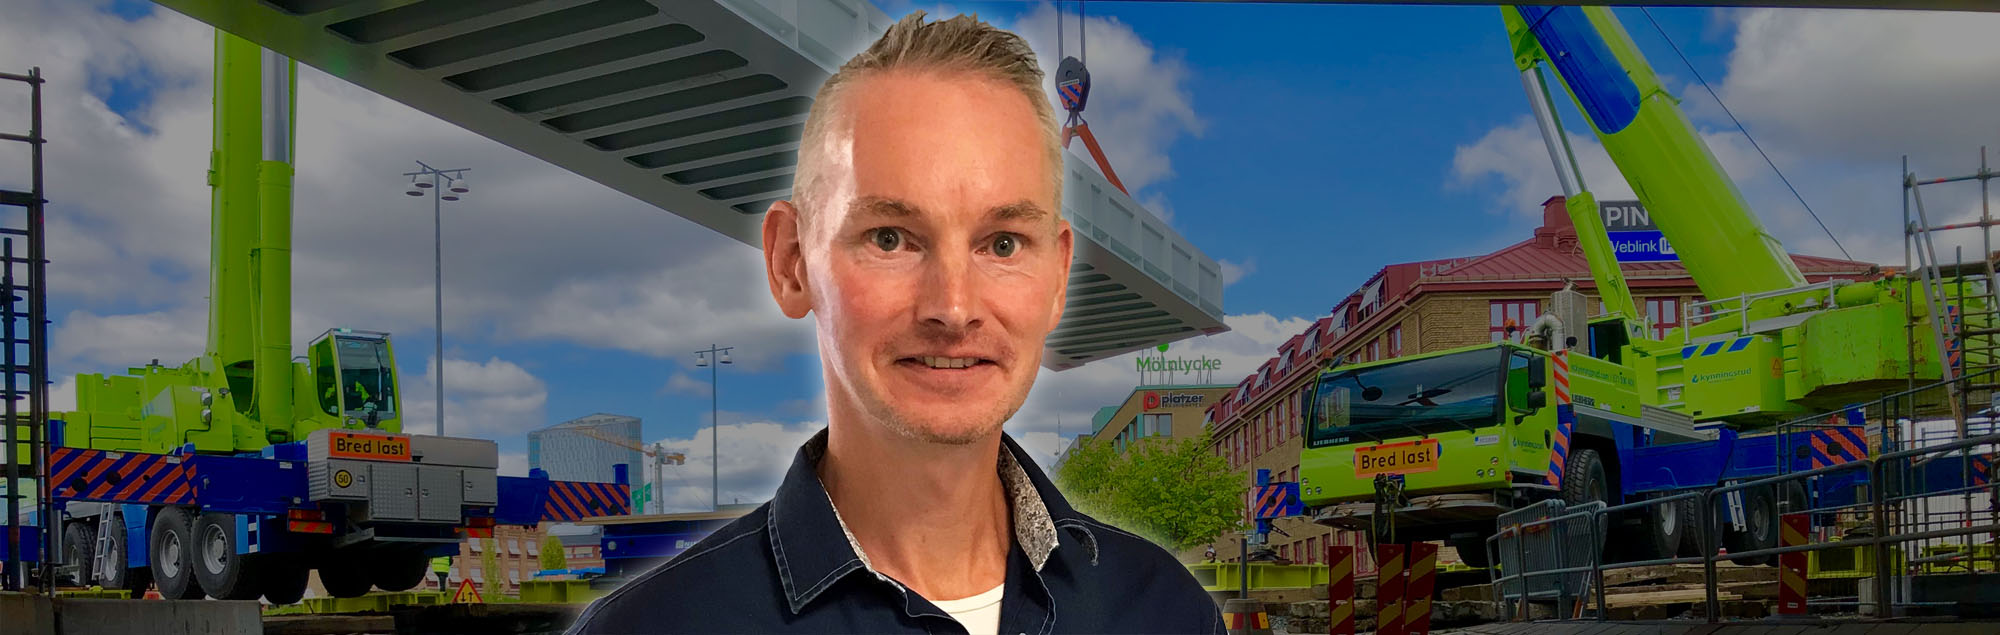 Ny sikkerhetssjef i Kynningsrud Nordic Crane AB